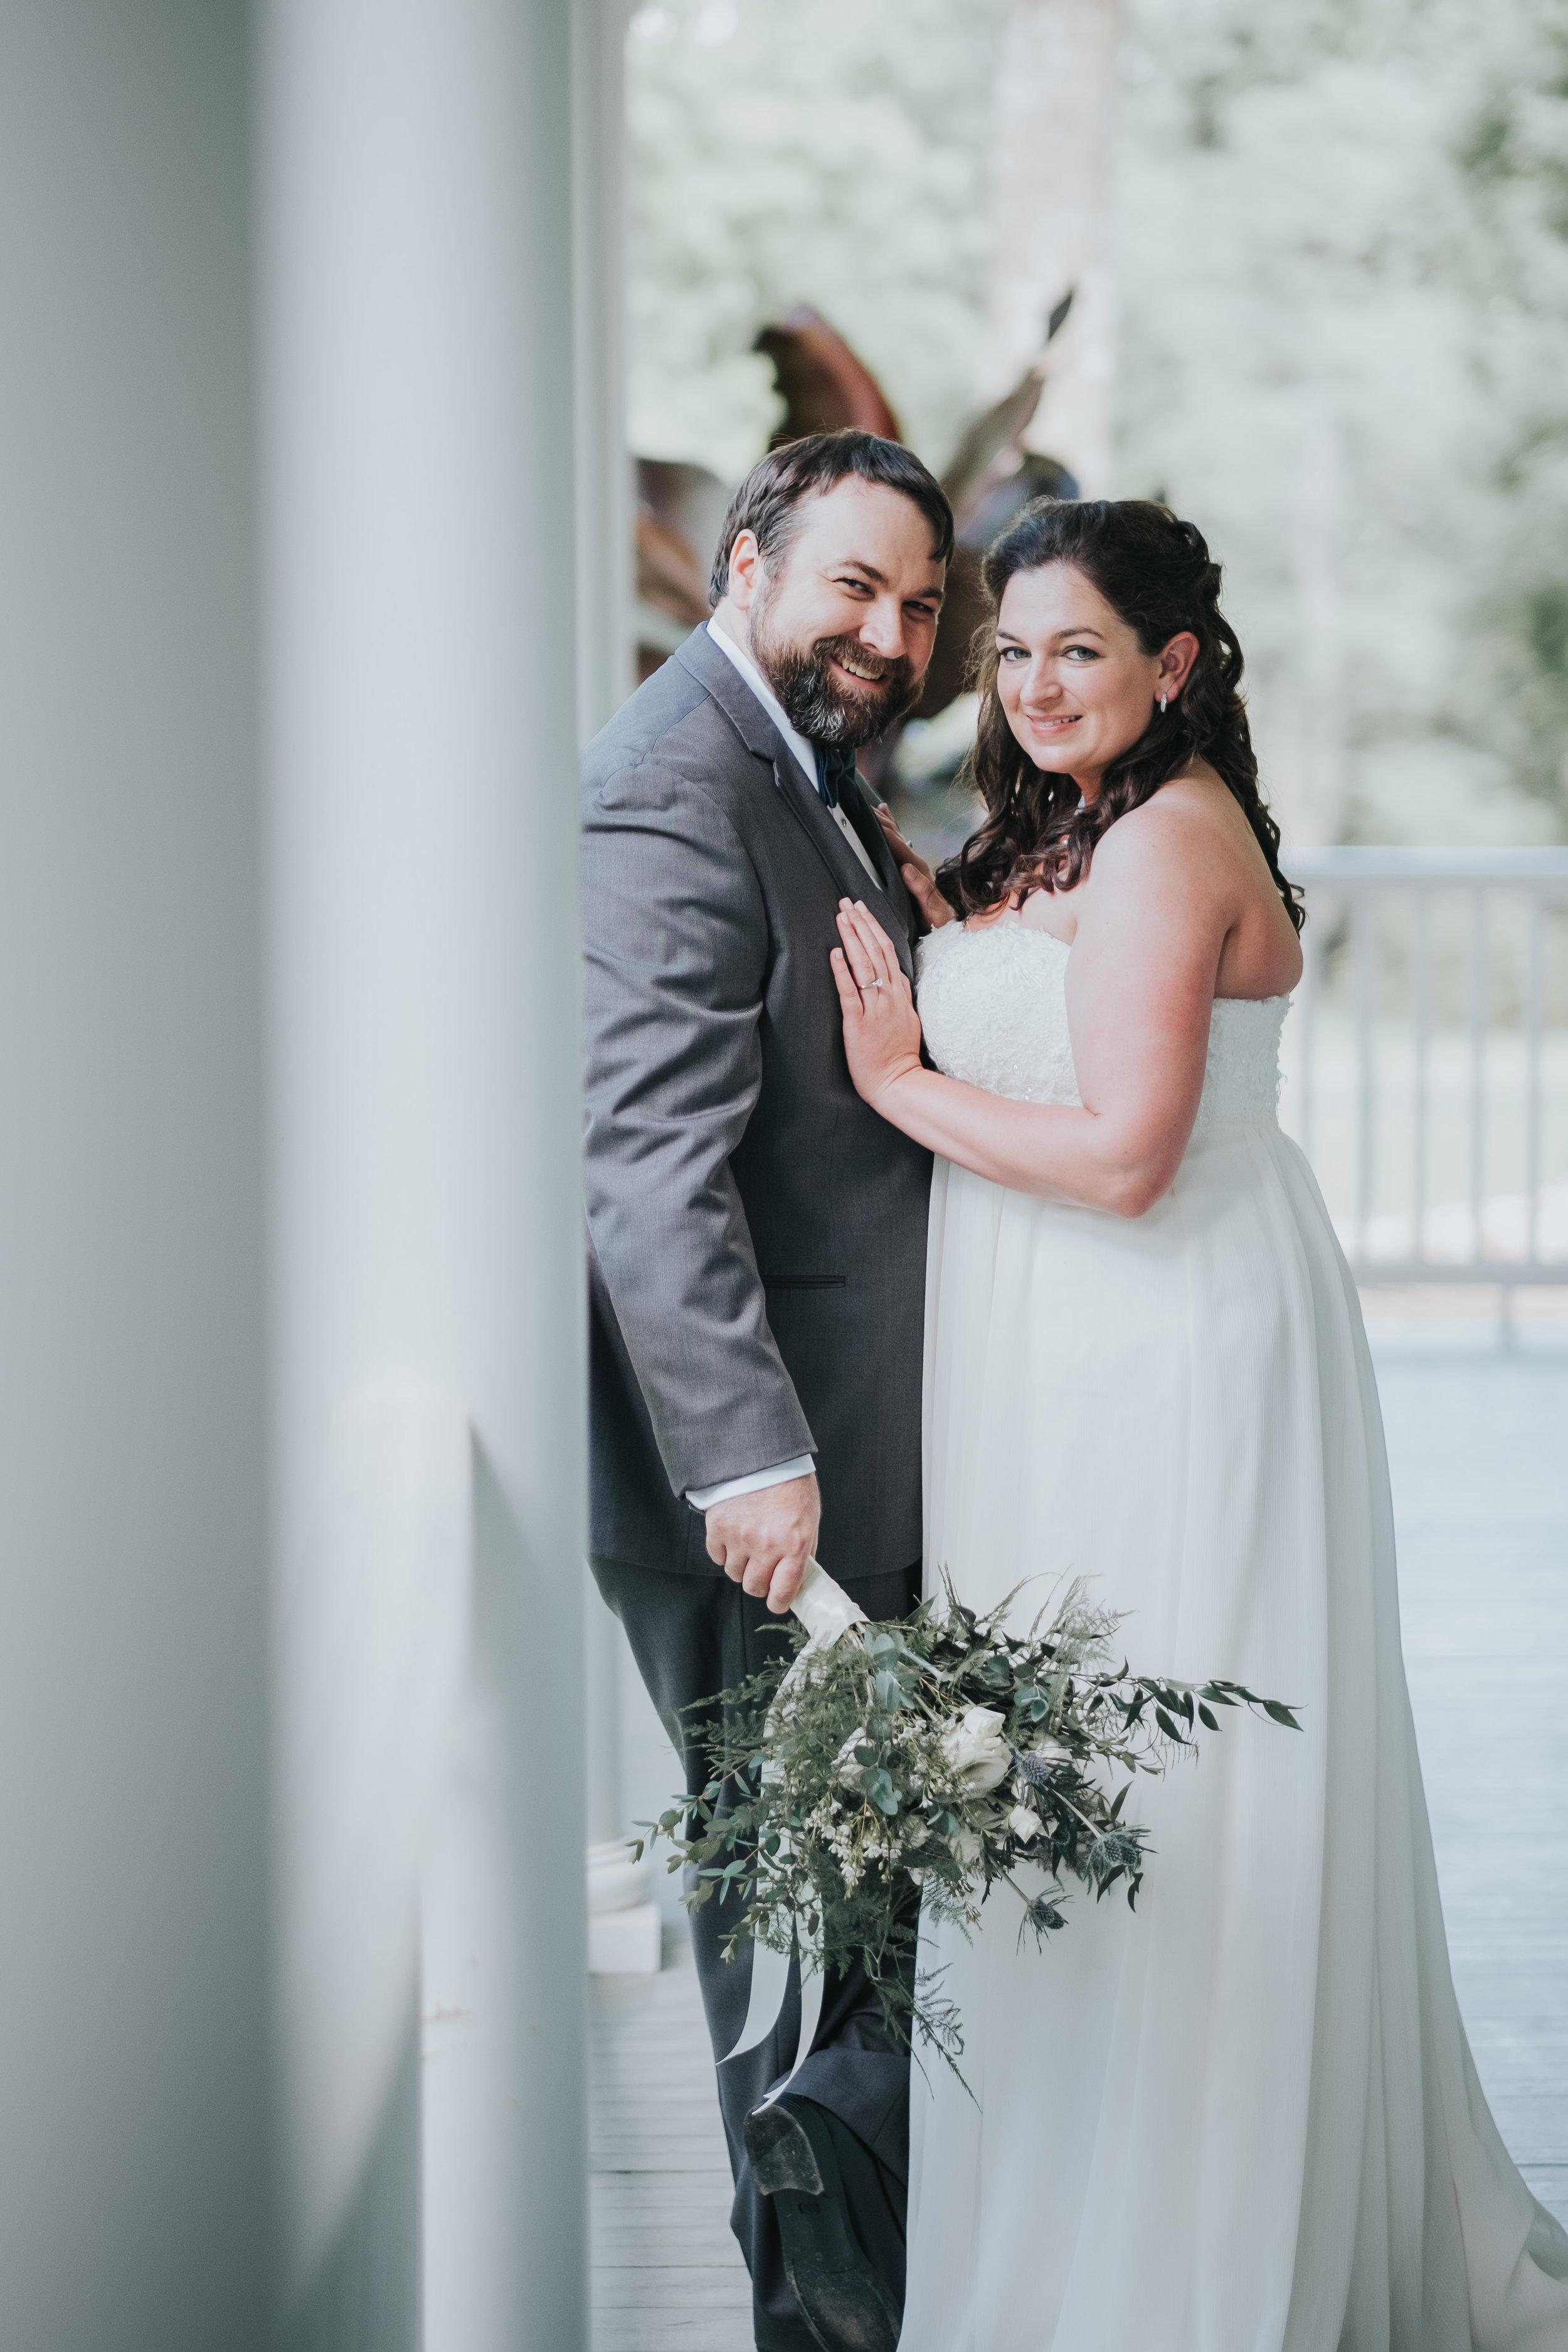 Ashley.Eric.Wedding.Delyn.2016.Mileswittboyer.Photographiccollective-251.jpg